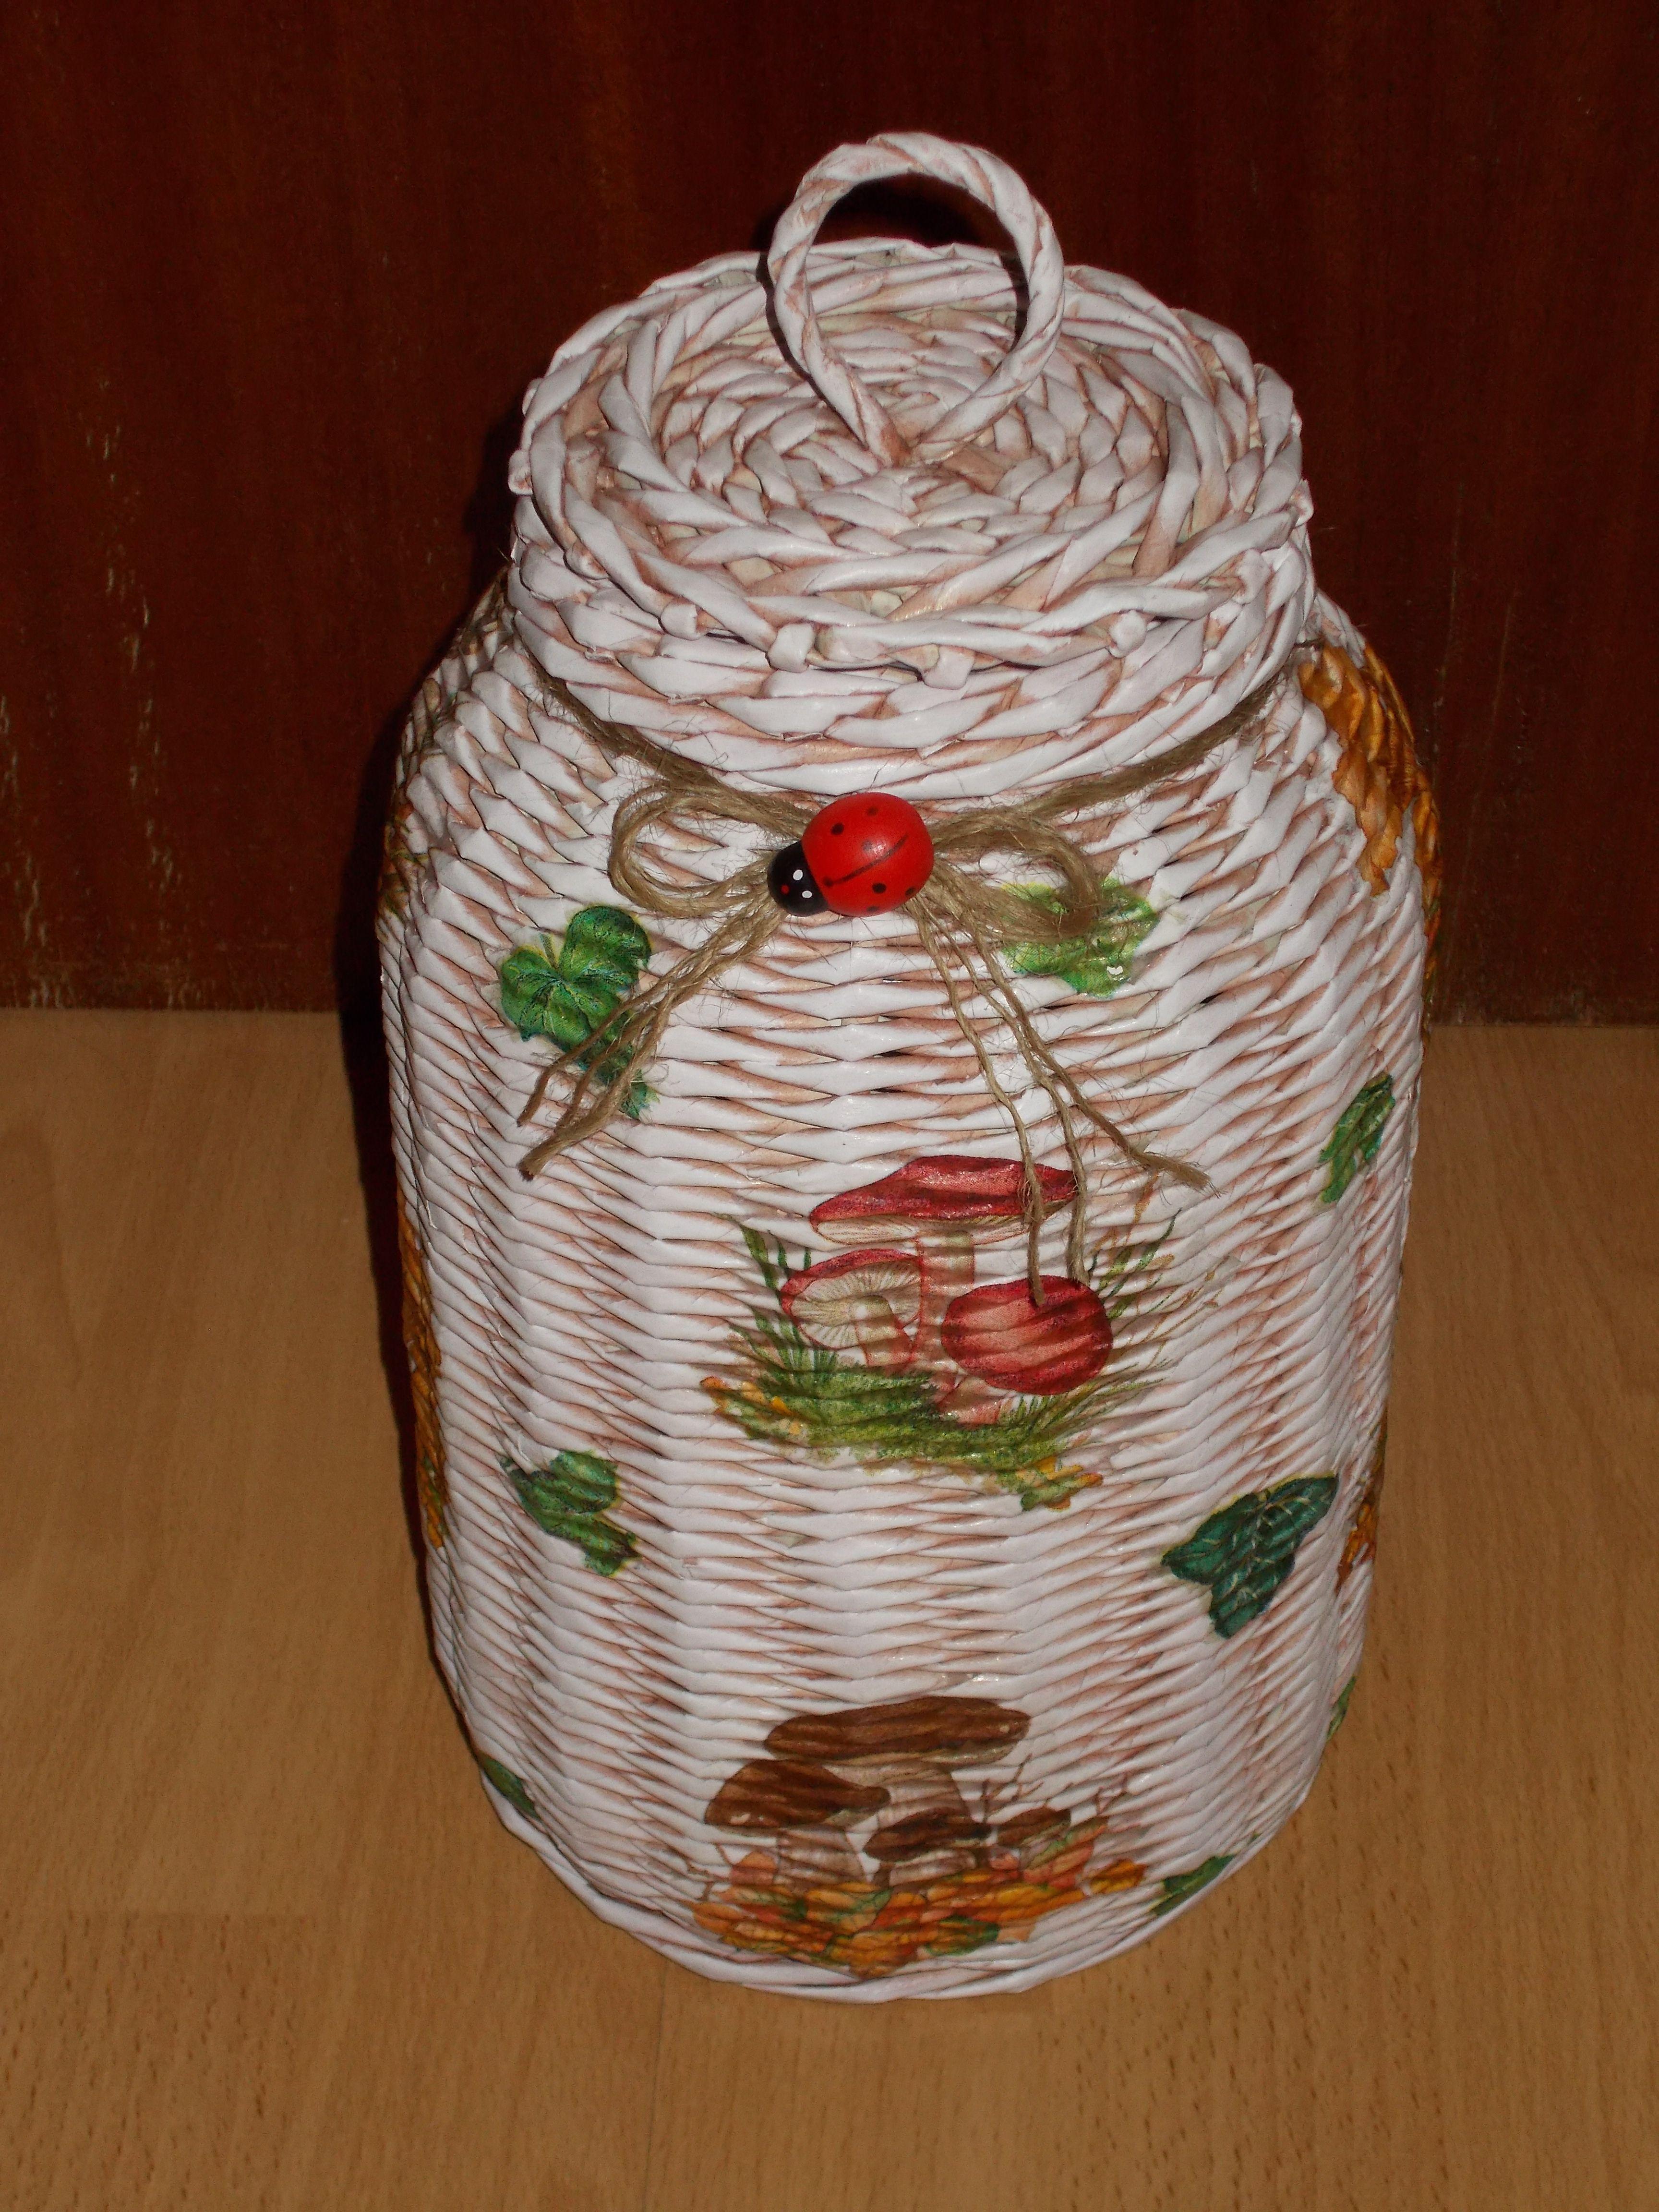 Frasco en mimbre para guardar lo que quieras artesania - Reciclar cestas de mimbre ...